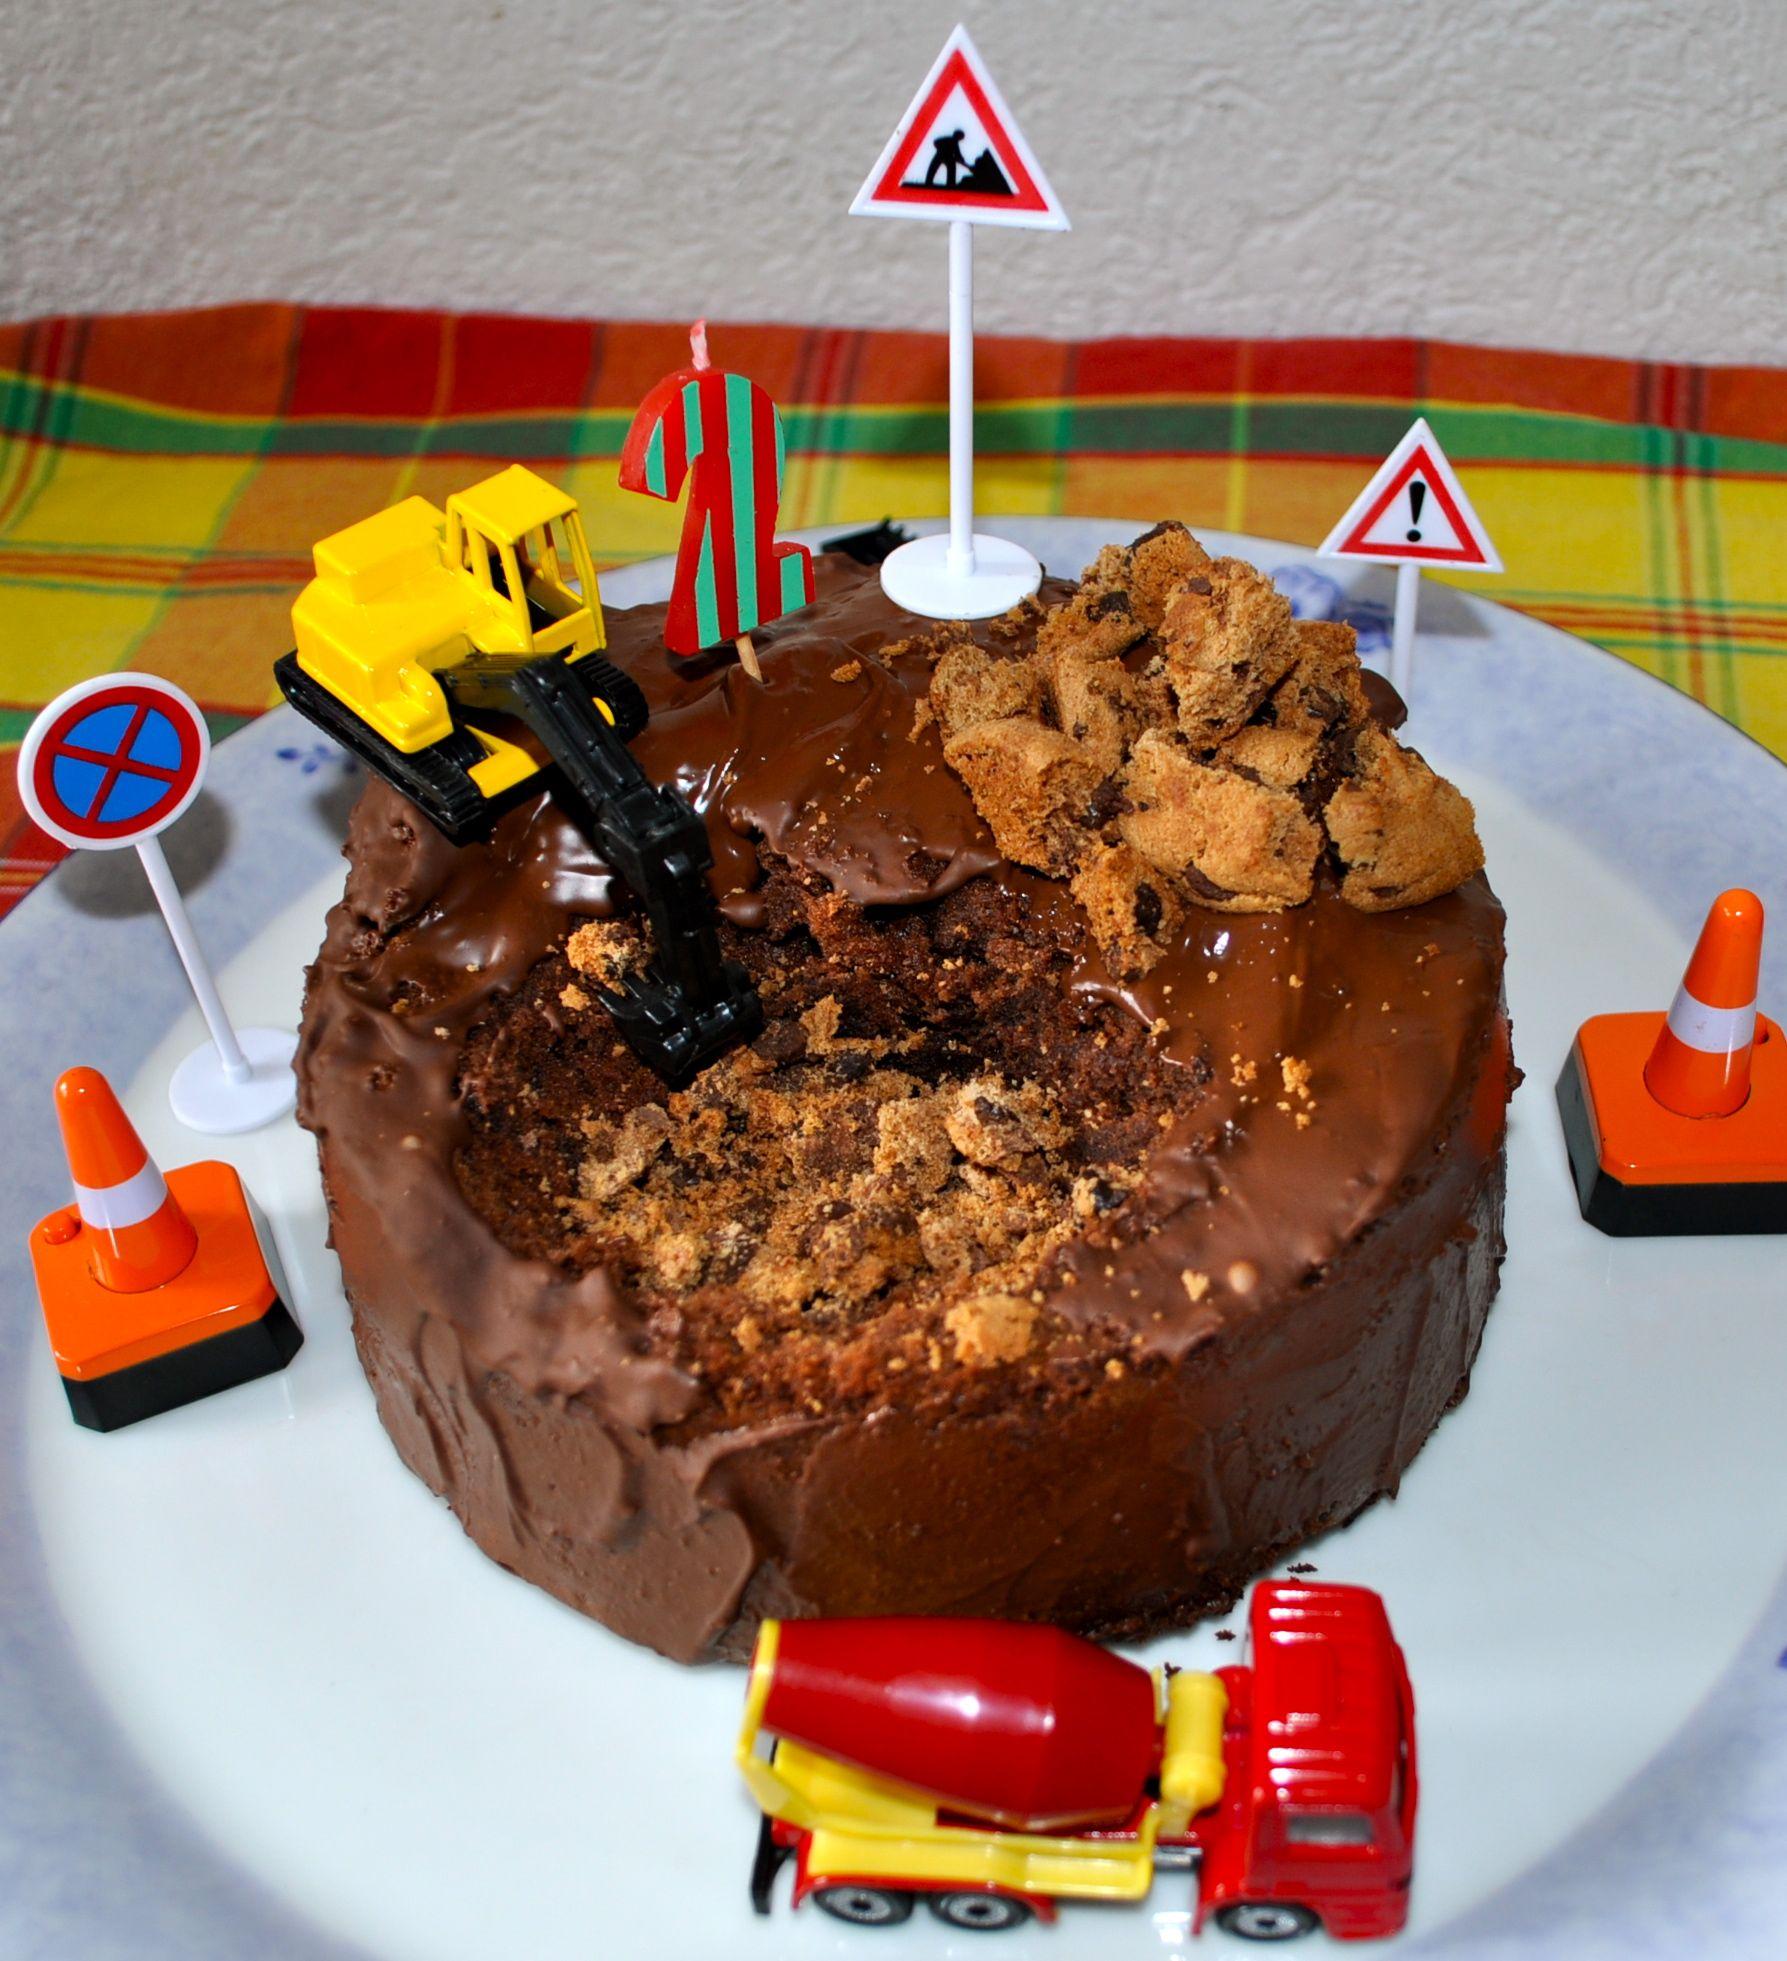 Pin By Samp Laster On Carros: Geburtstagskuchen-Baustelle